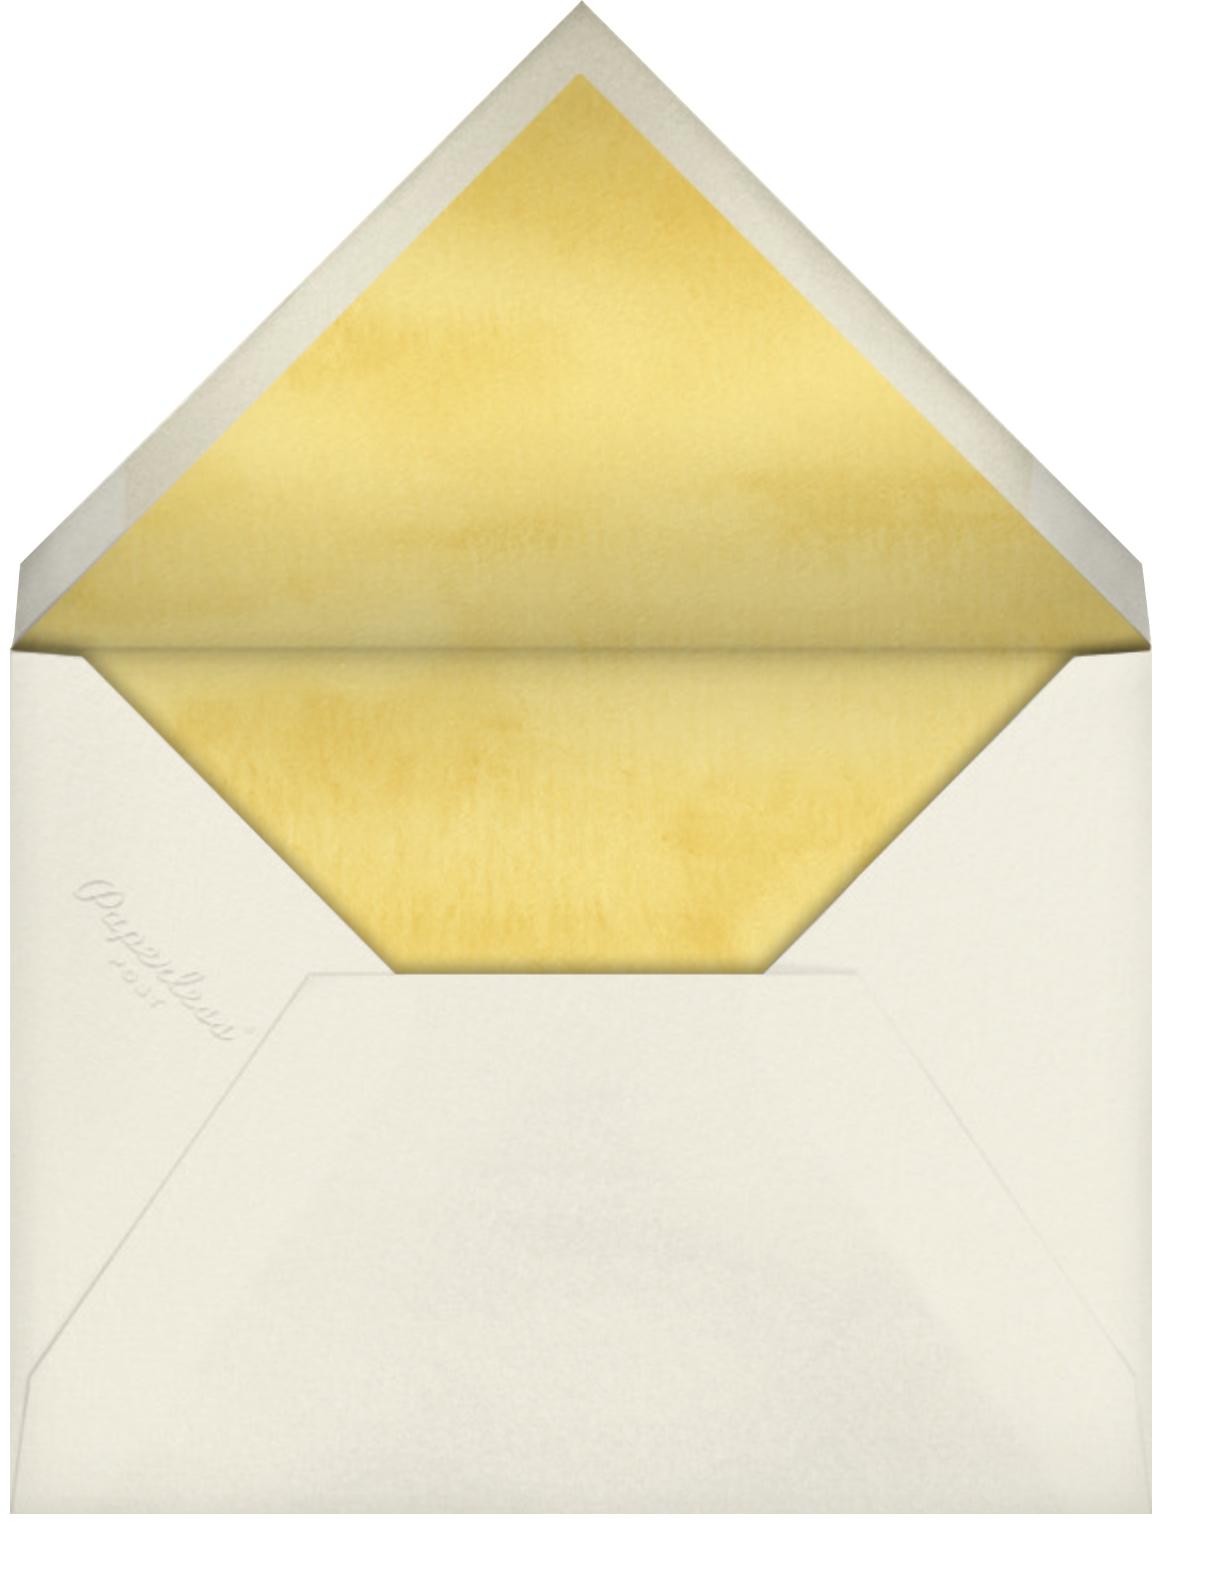 Gingko - Felix Doolittle - General entertaining - envelope back